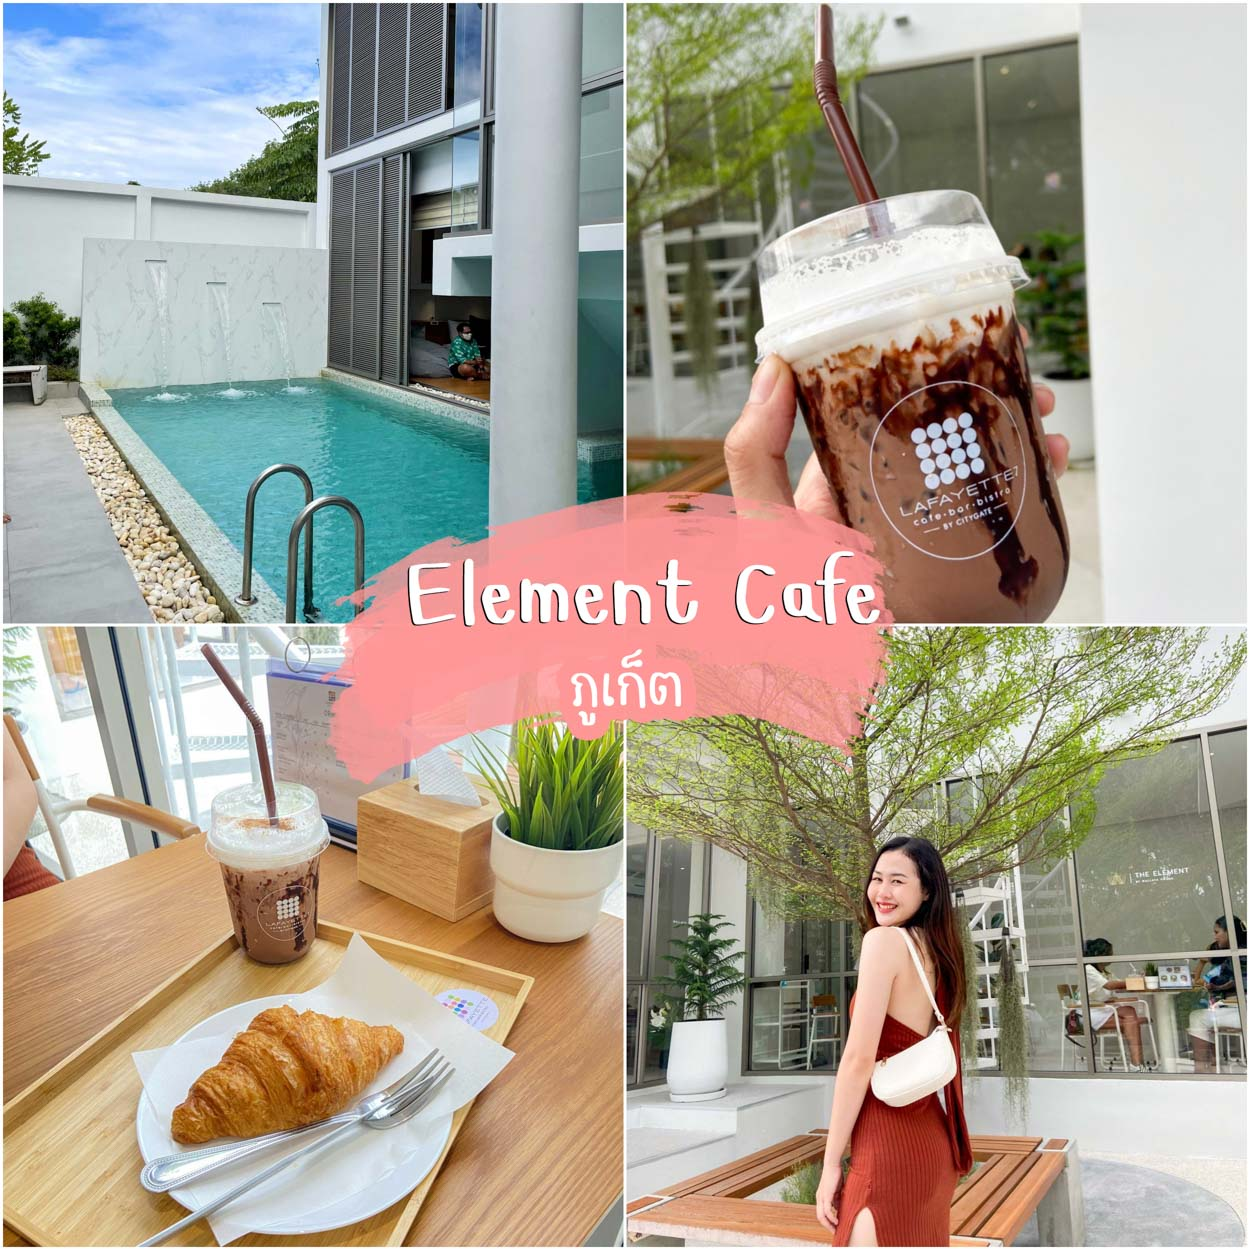 Element cafe by lafayette7 คาเฟ่ภูเก็ตเปิดใหม่ย่านป่าสักบางโจ คุมโทนสไตล์มินิมอล